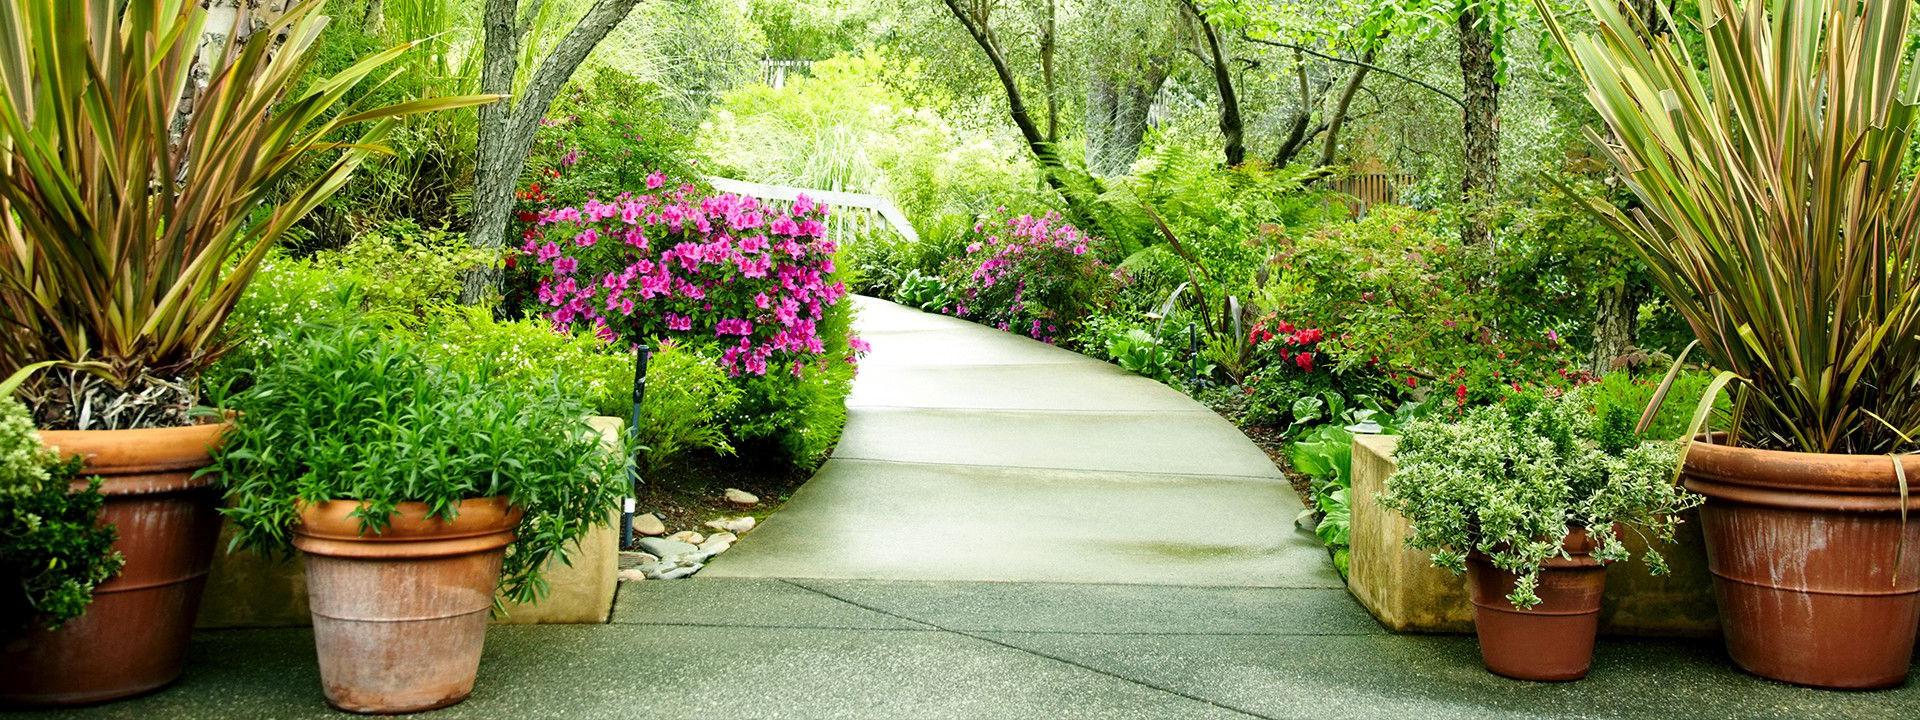 Resources | Kreidler Funeral Home, Inc.